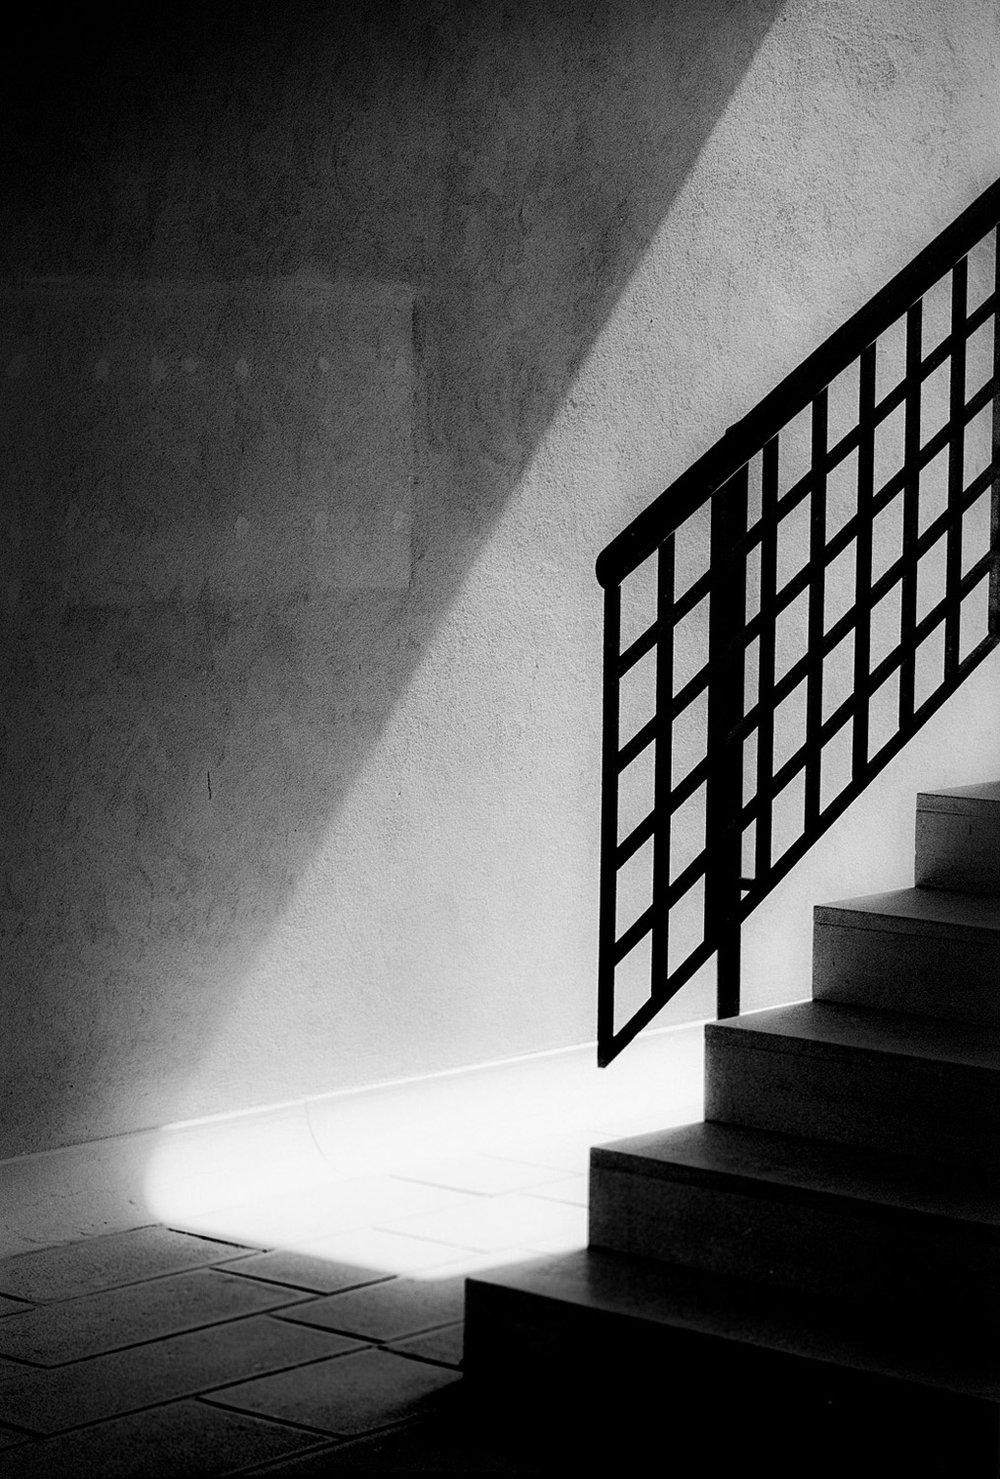 Venice - Stairs & Shadows